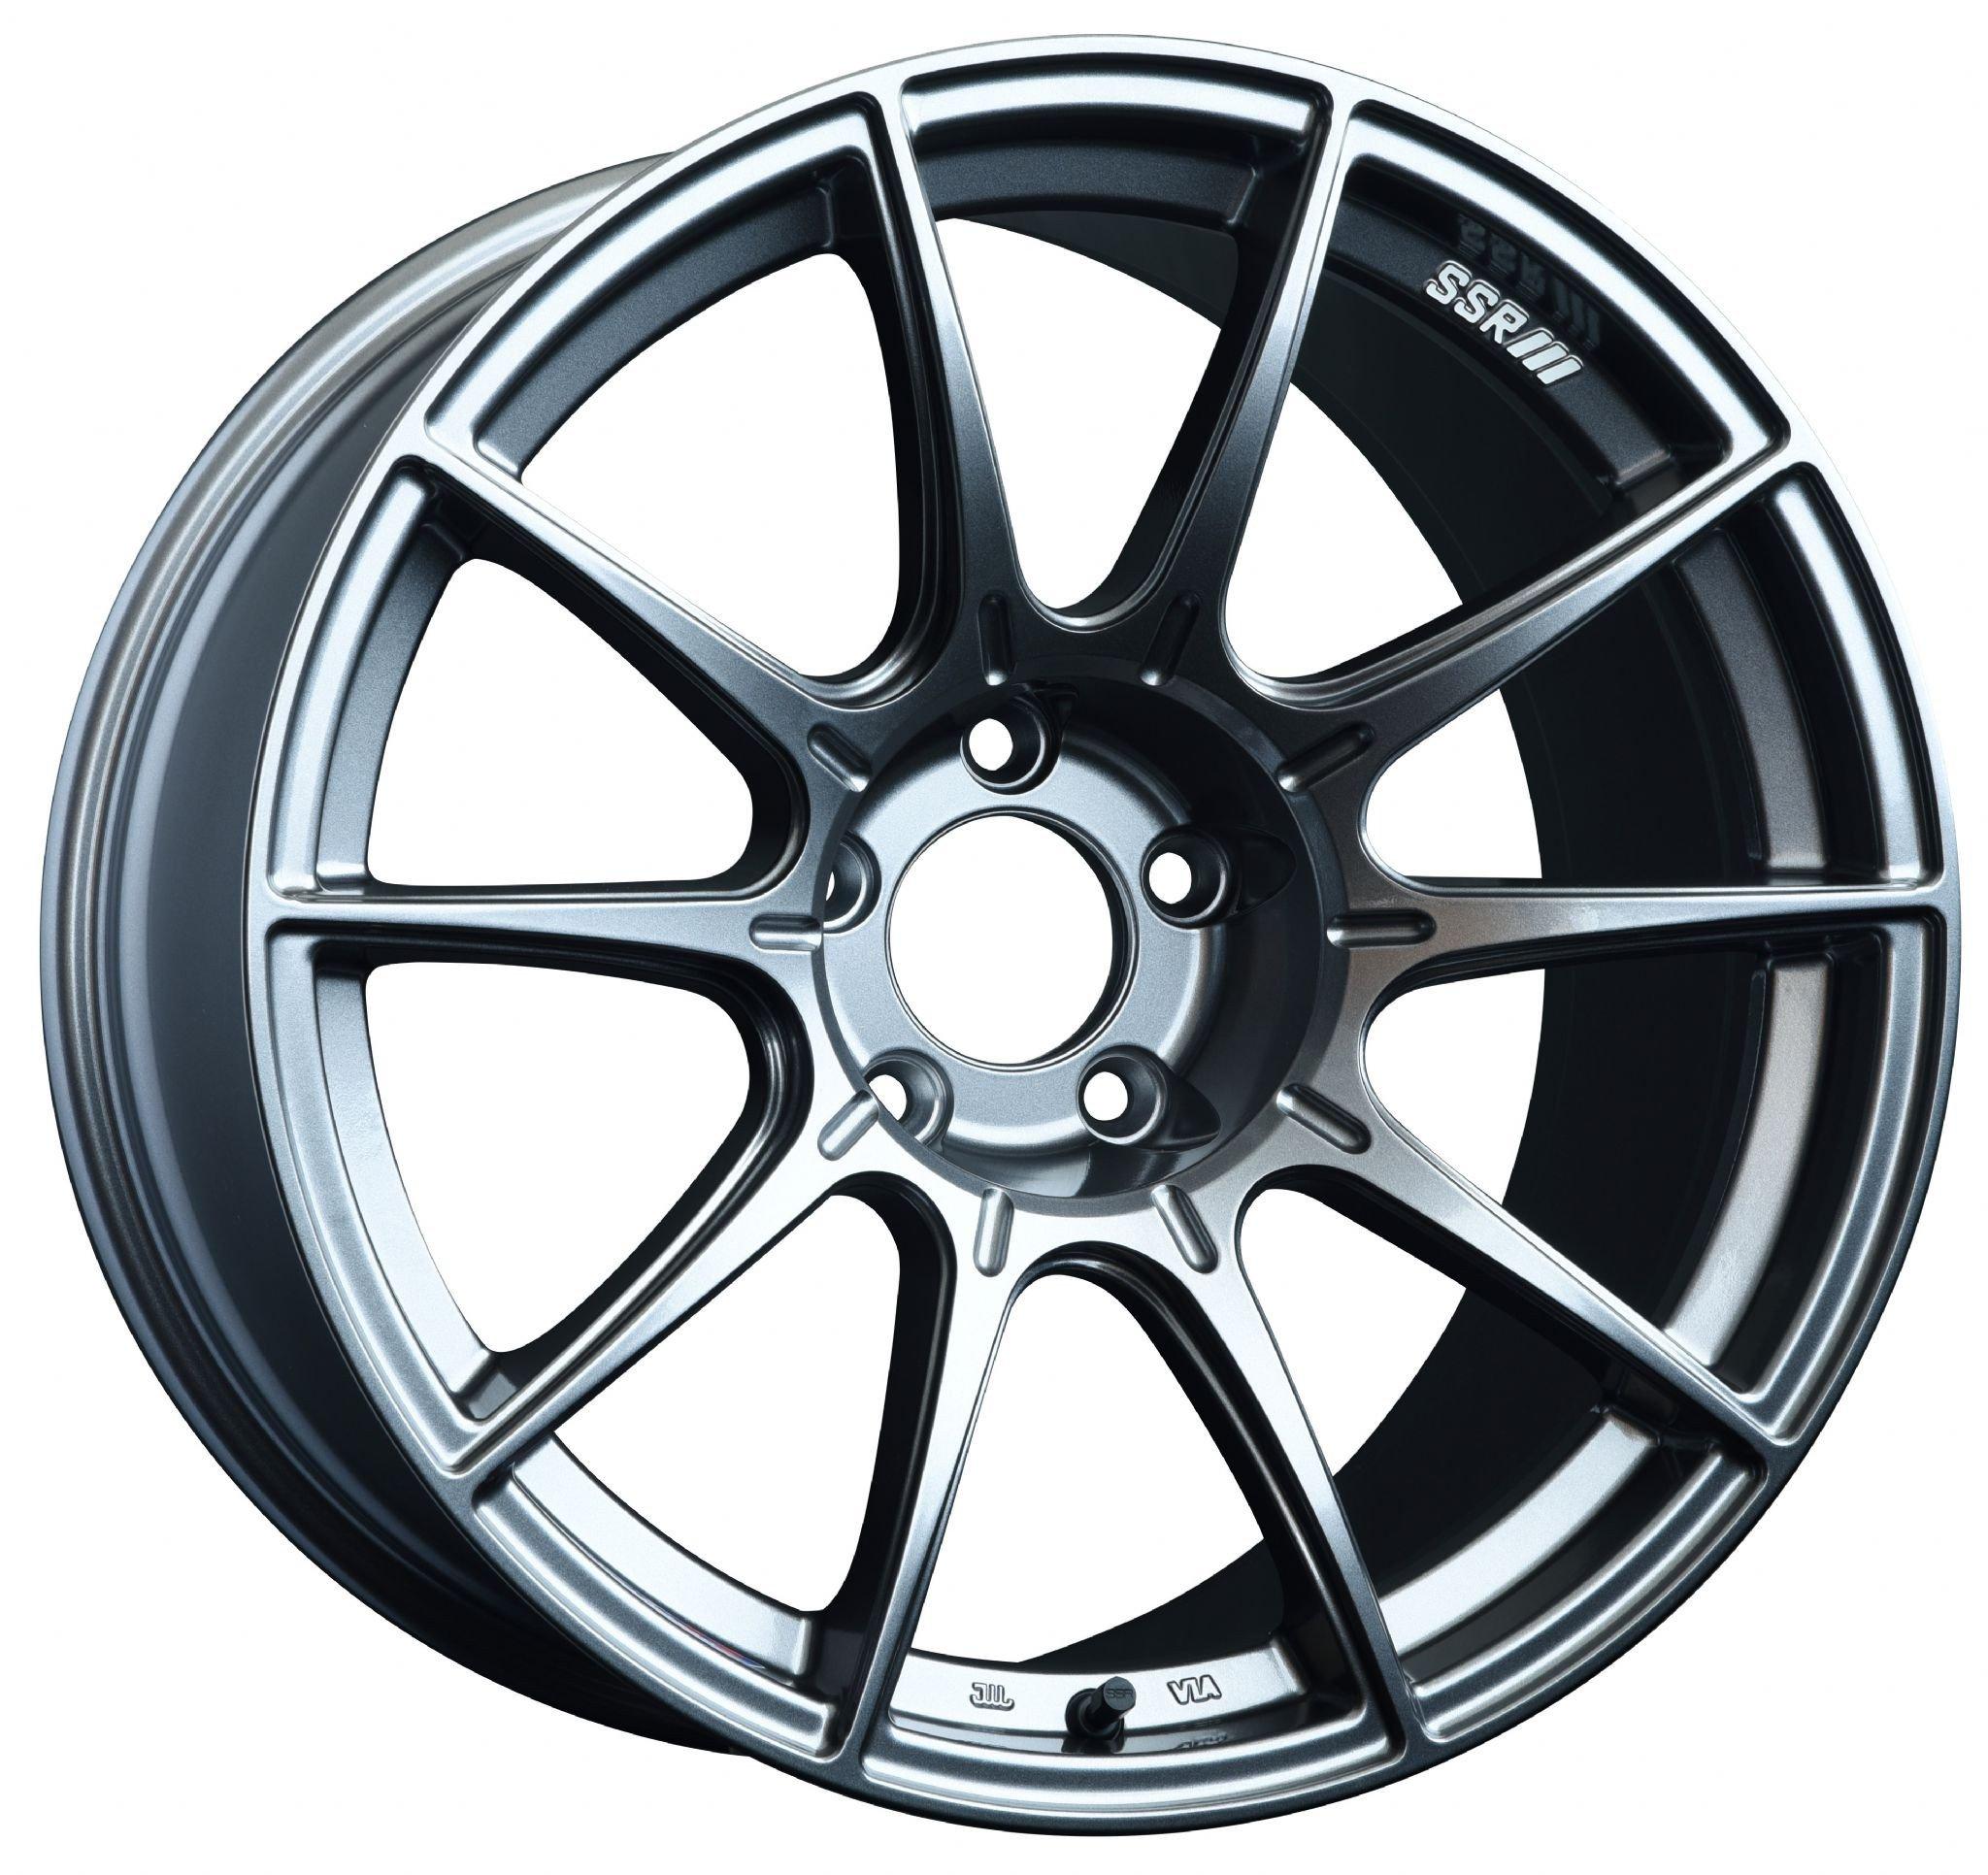 ssr-gtx01-18×9.5-rim-size-5×100-bolt-pattern-40mm-offset-dark-silver-wheel-scion-frs-subaru-brz-173035-p